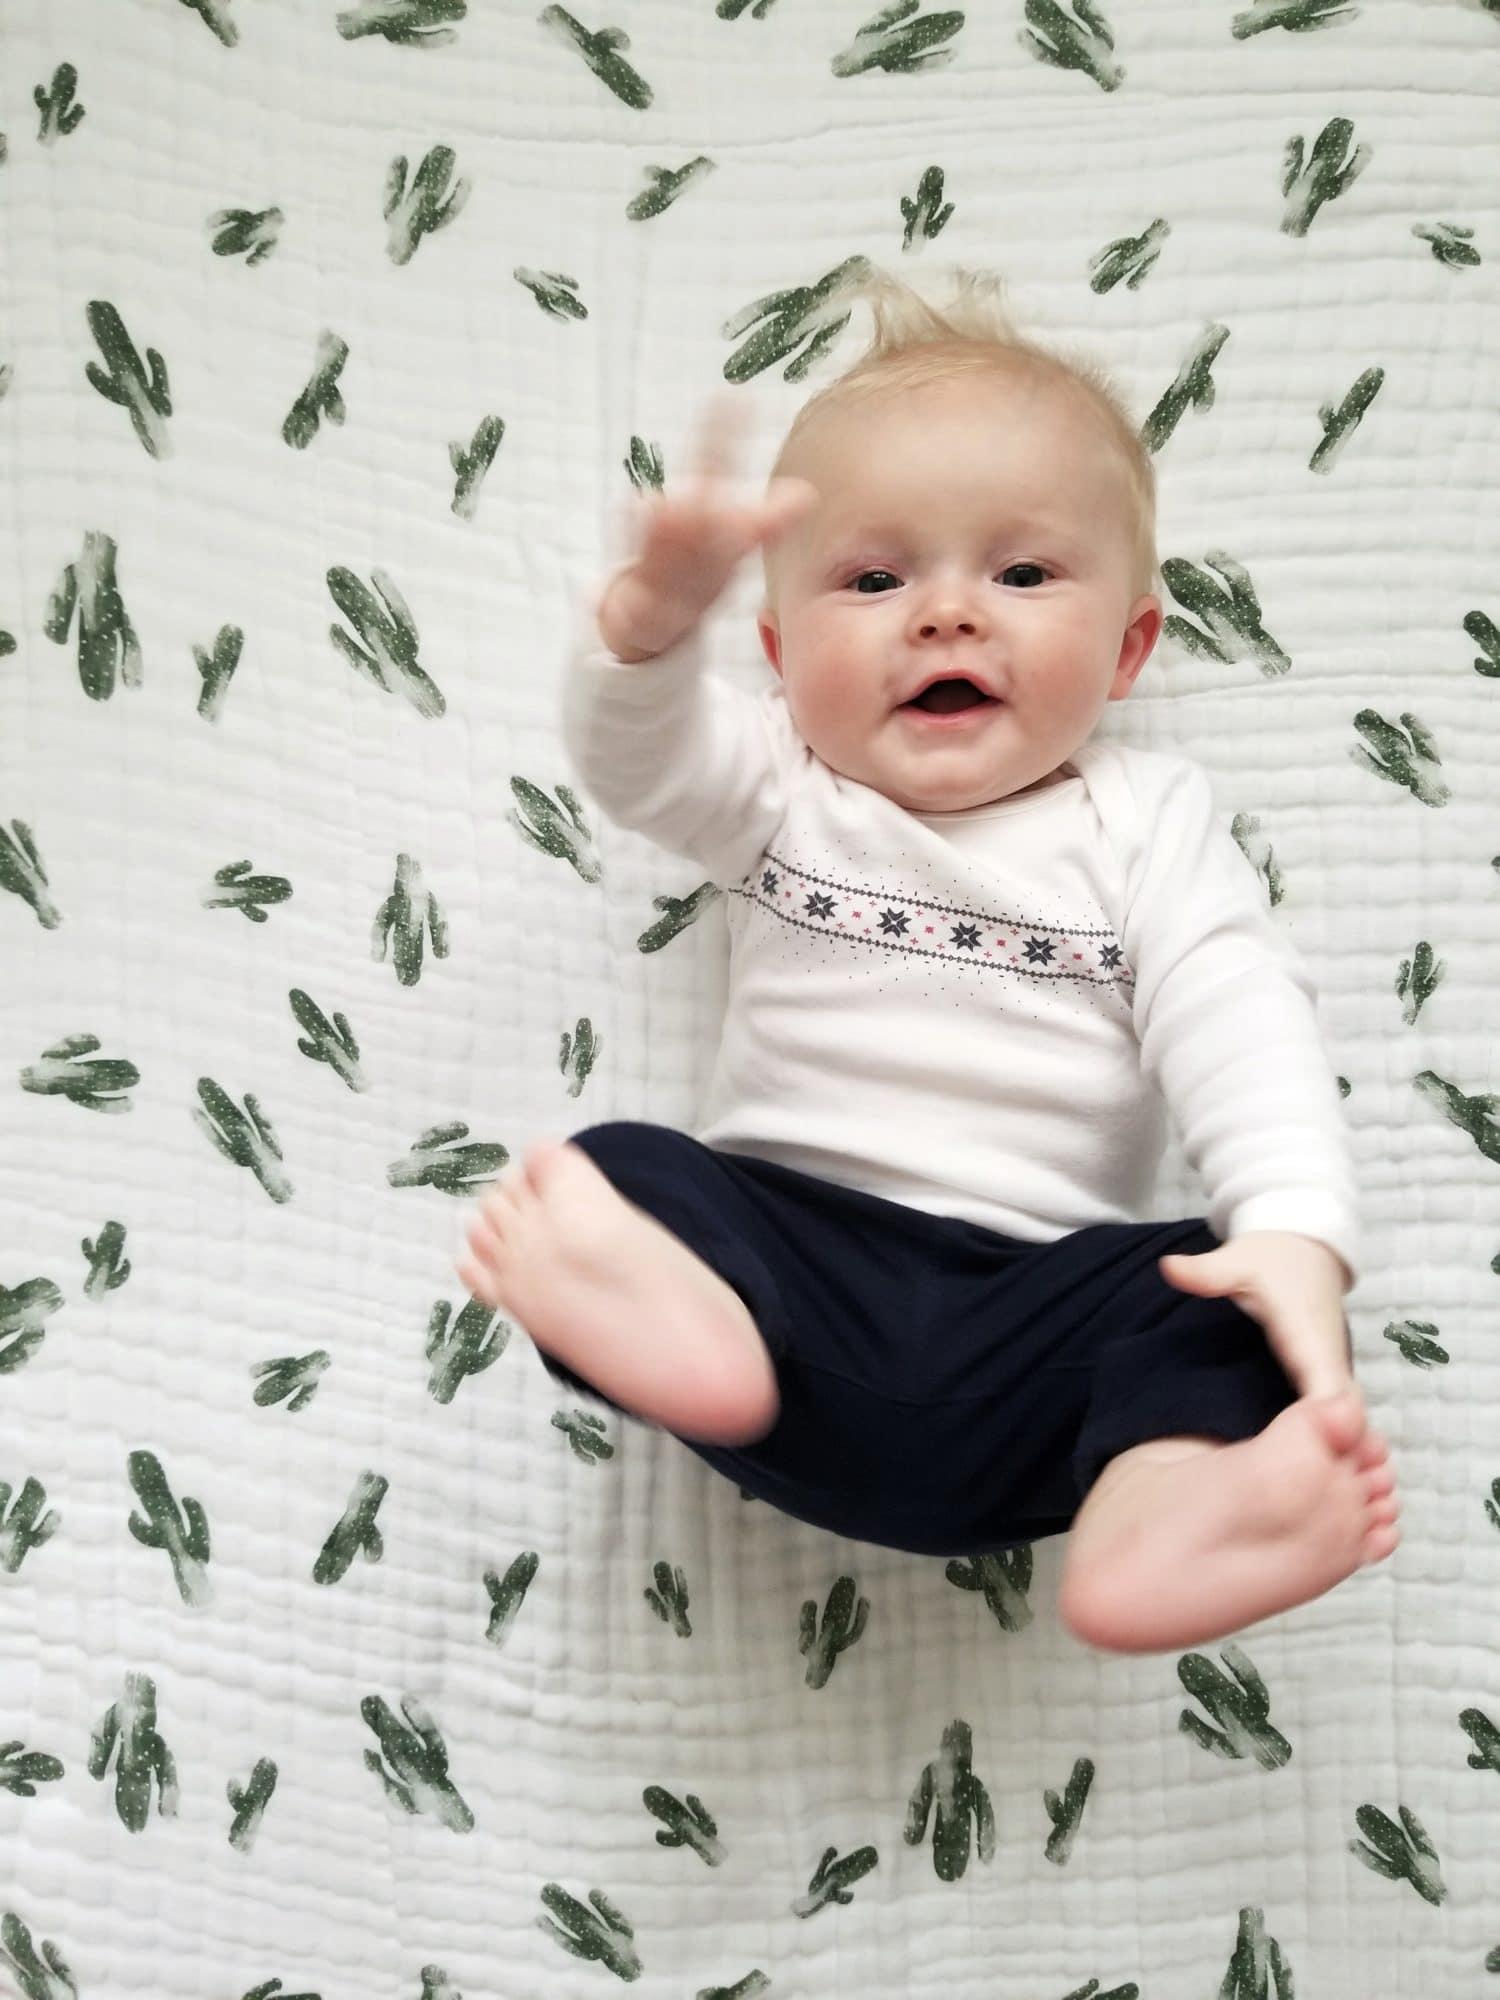 Six month old baby development and milestones. funnyloveblog.com